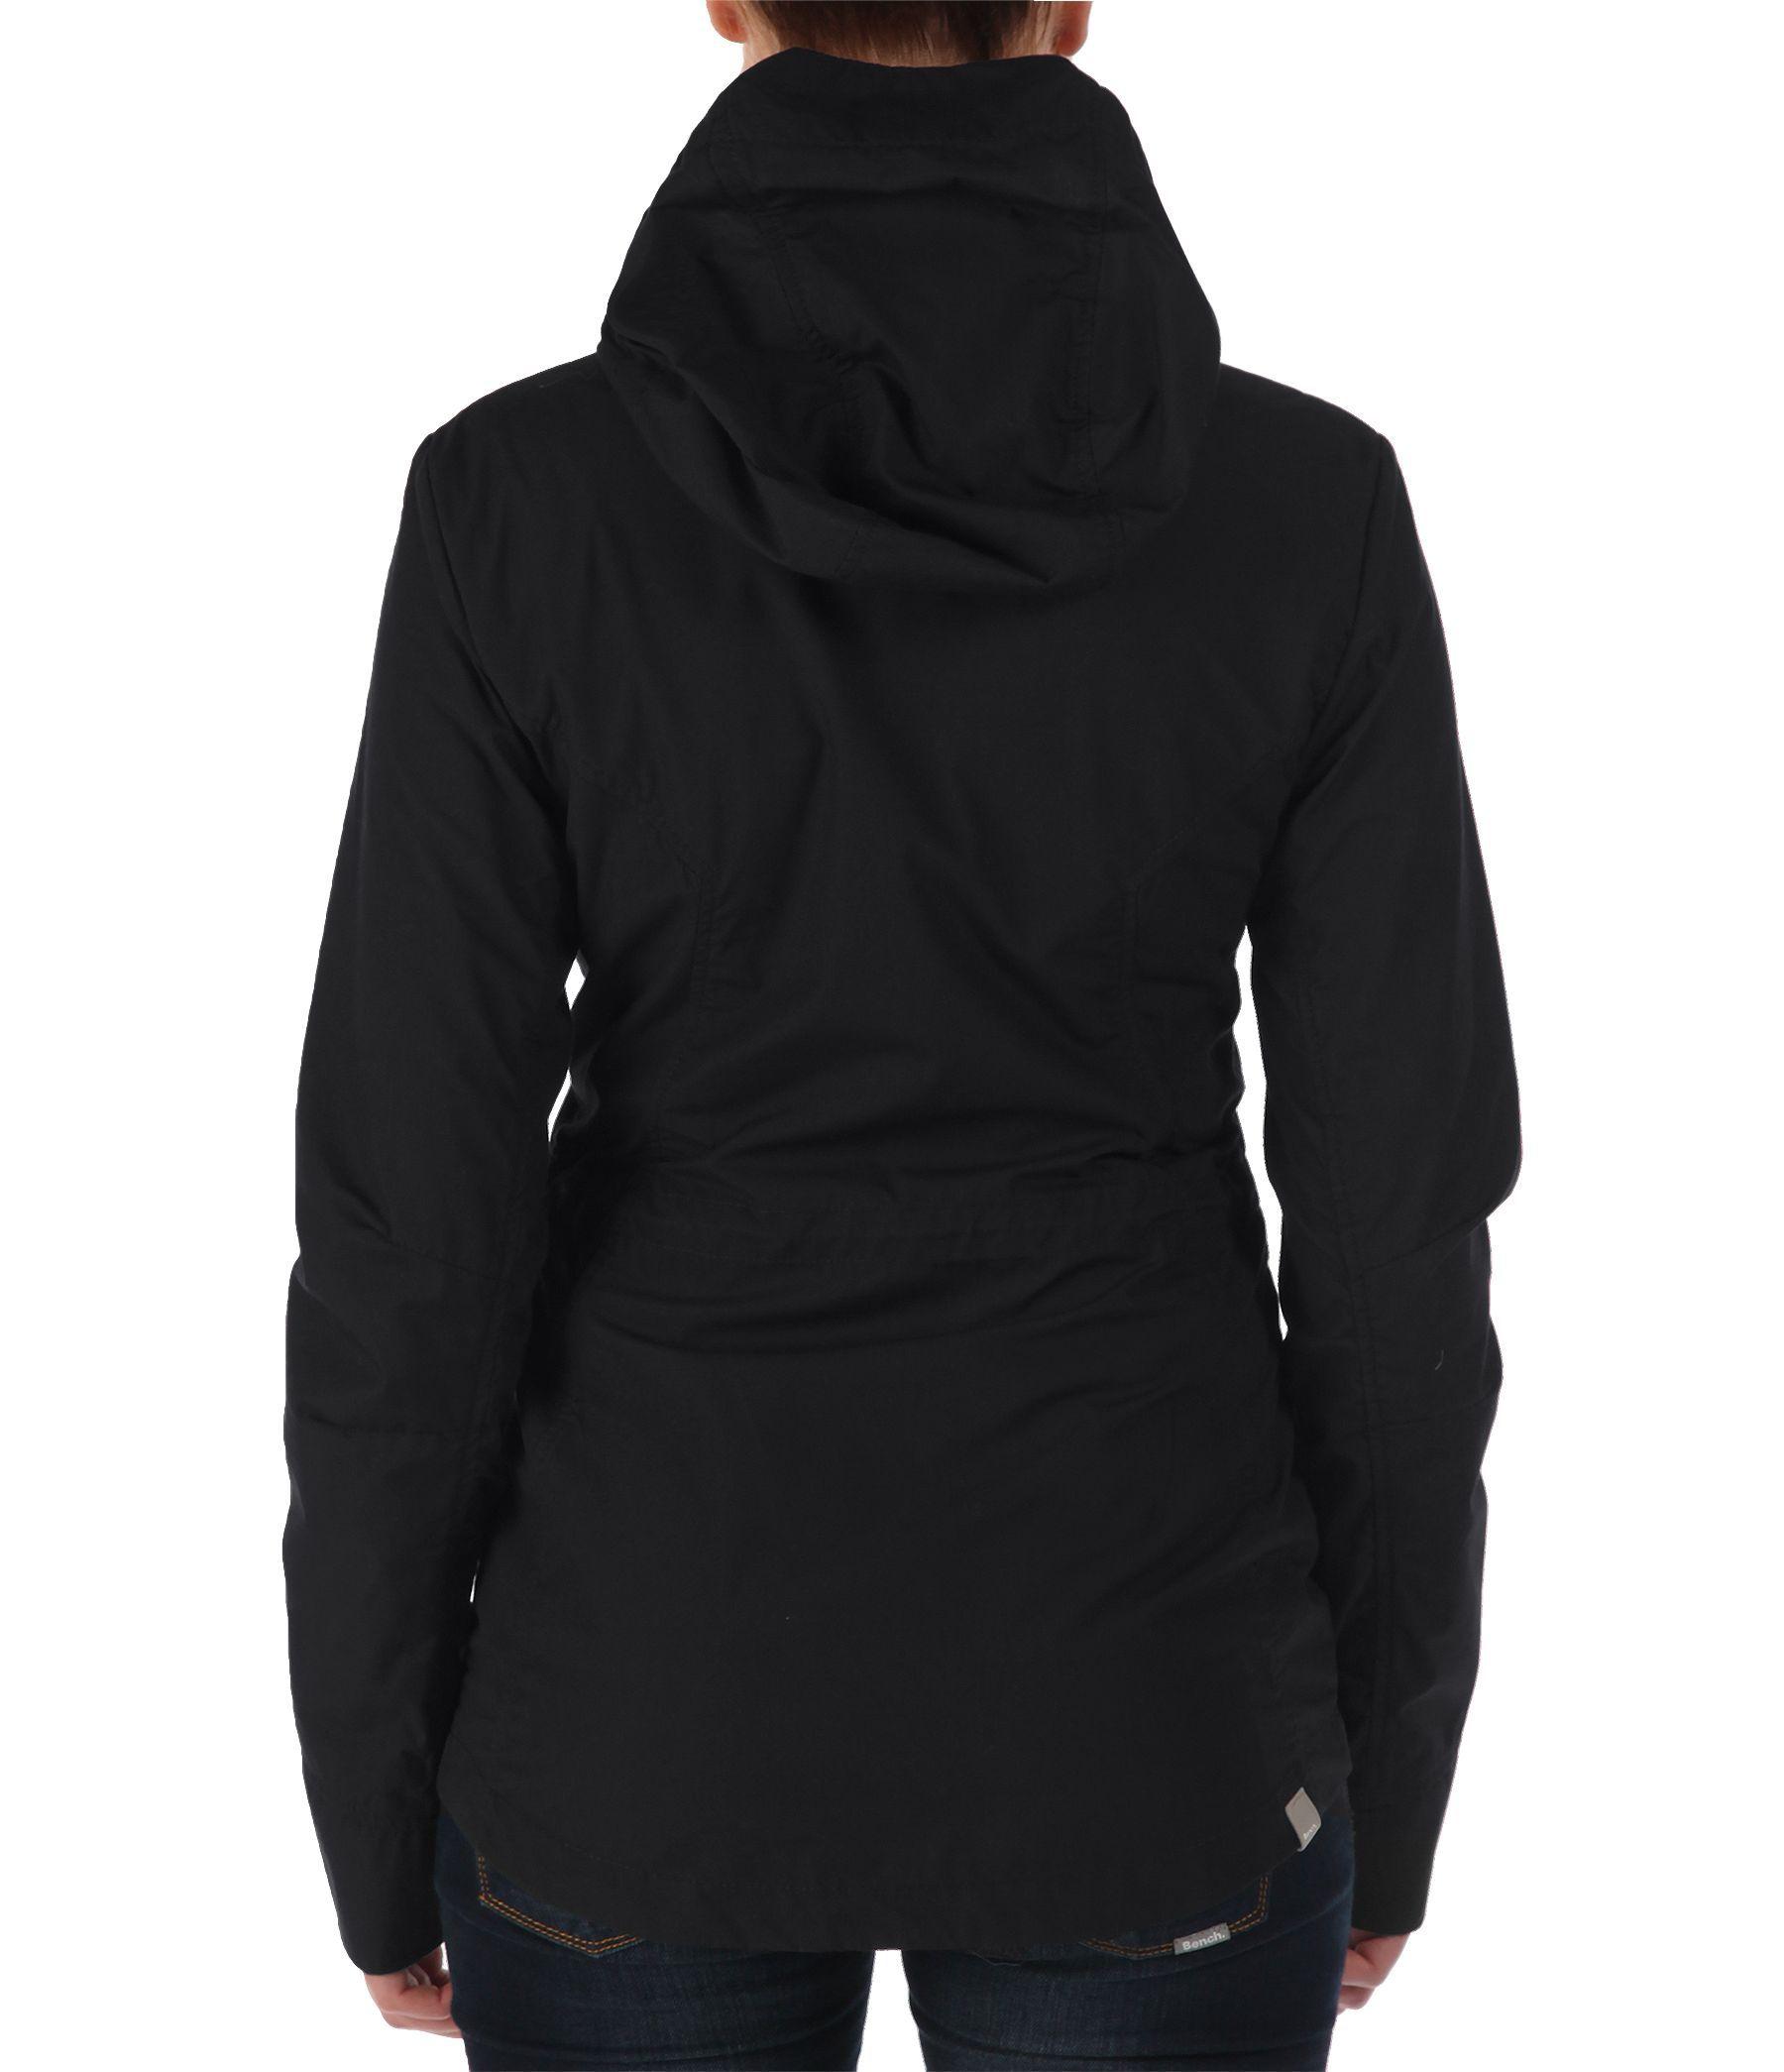 Bench Oppose Ii B Lightweight Softshell Jacket in Black | Lyst